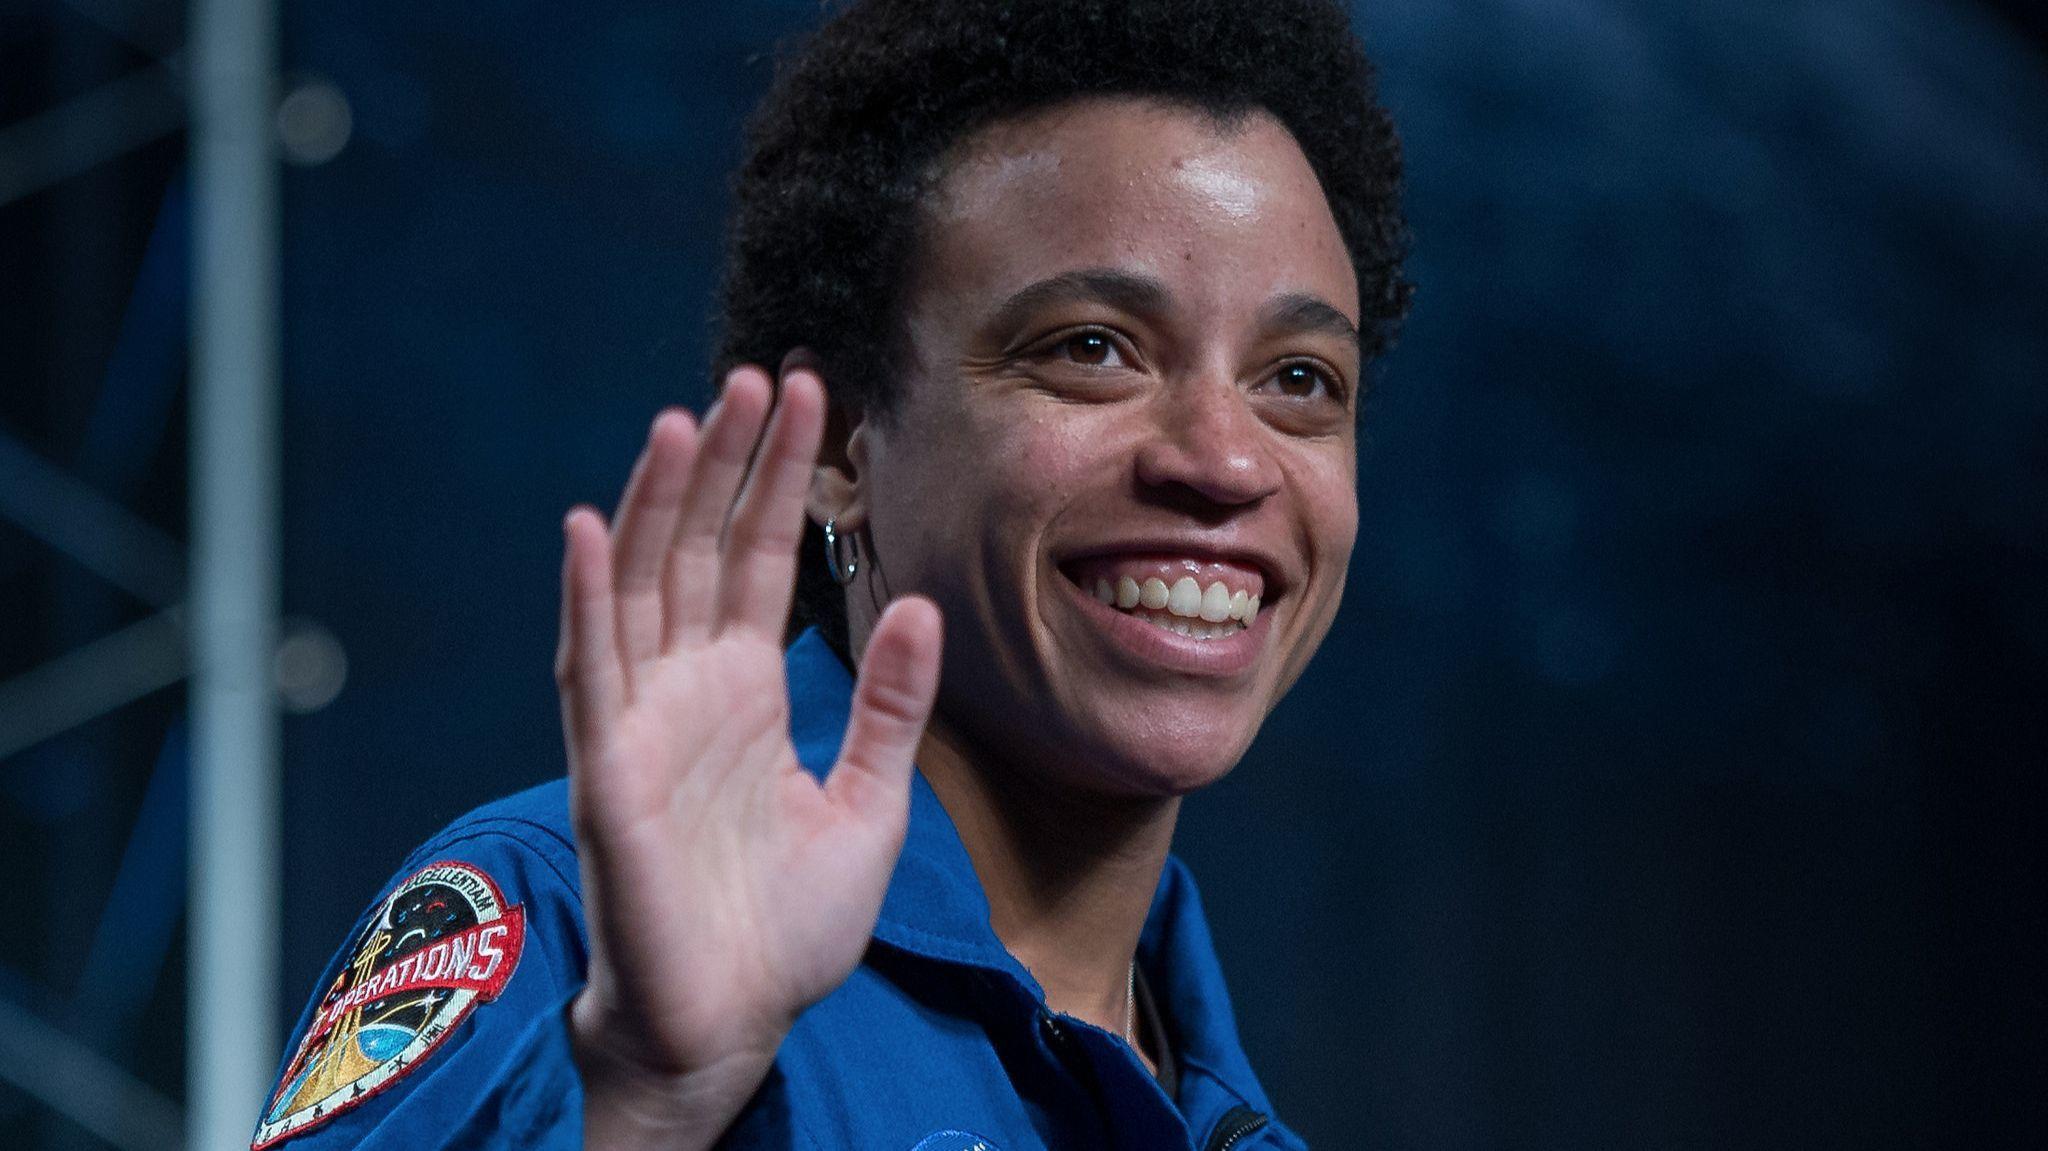 Astronaut Candidate Jessica Watkins